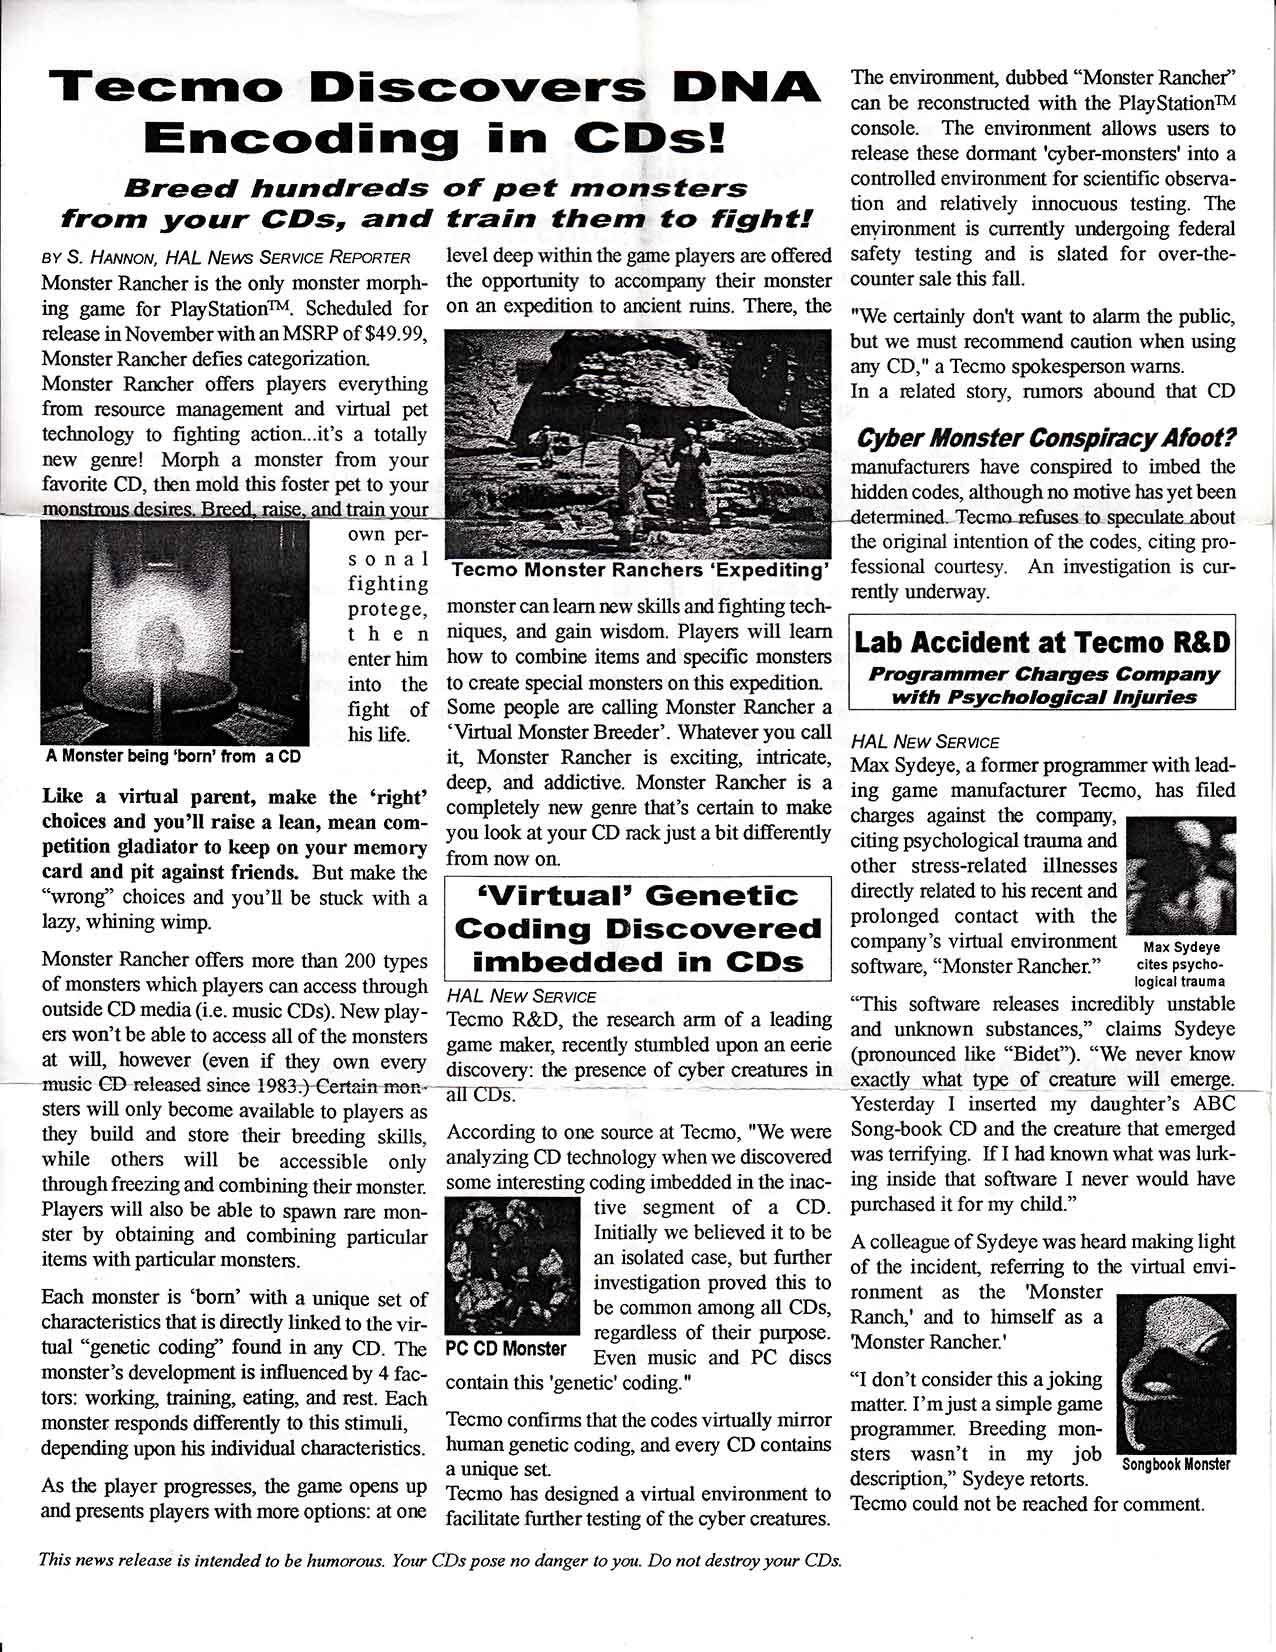 PSX-Trade-Monster-Rancher-News-2-Release